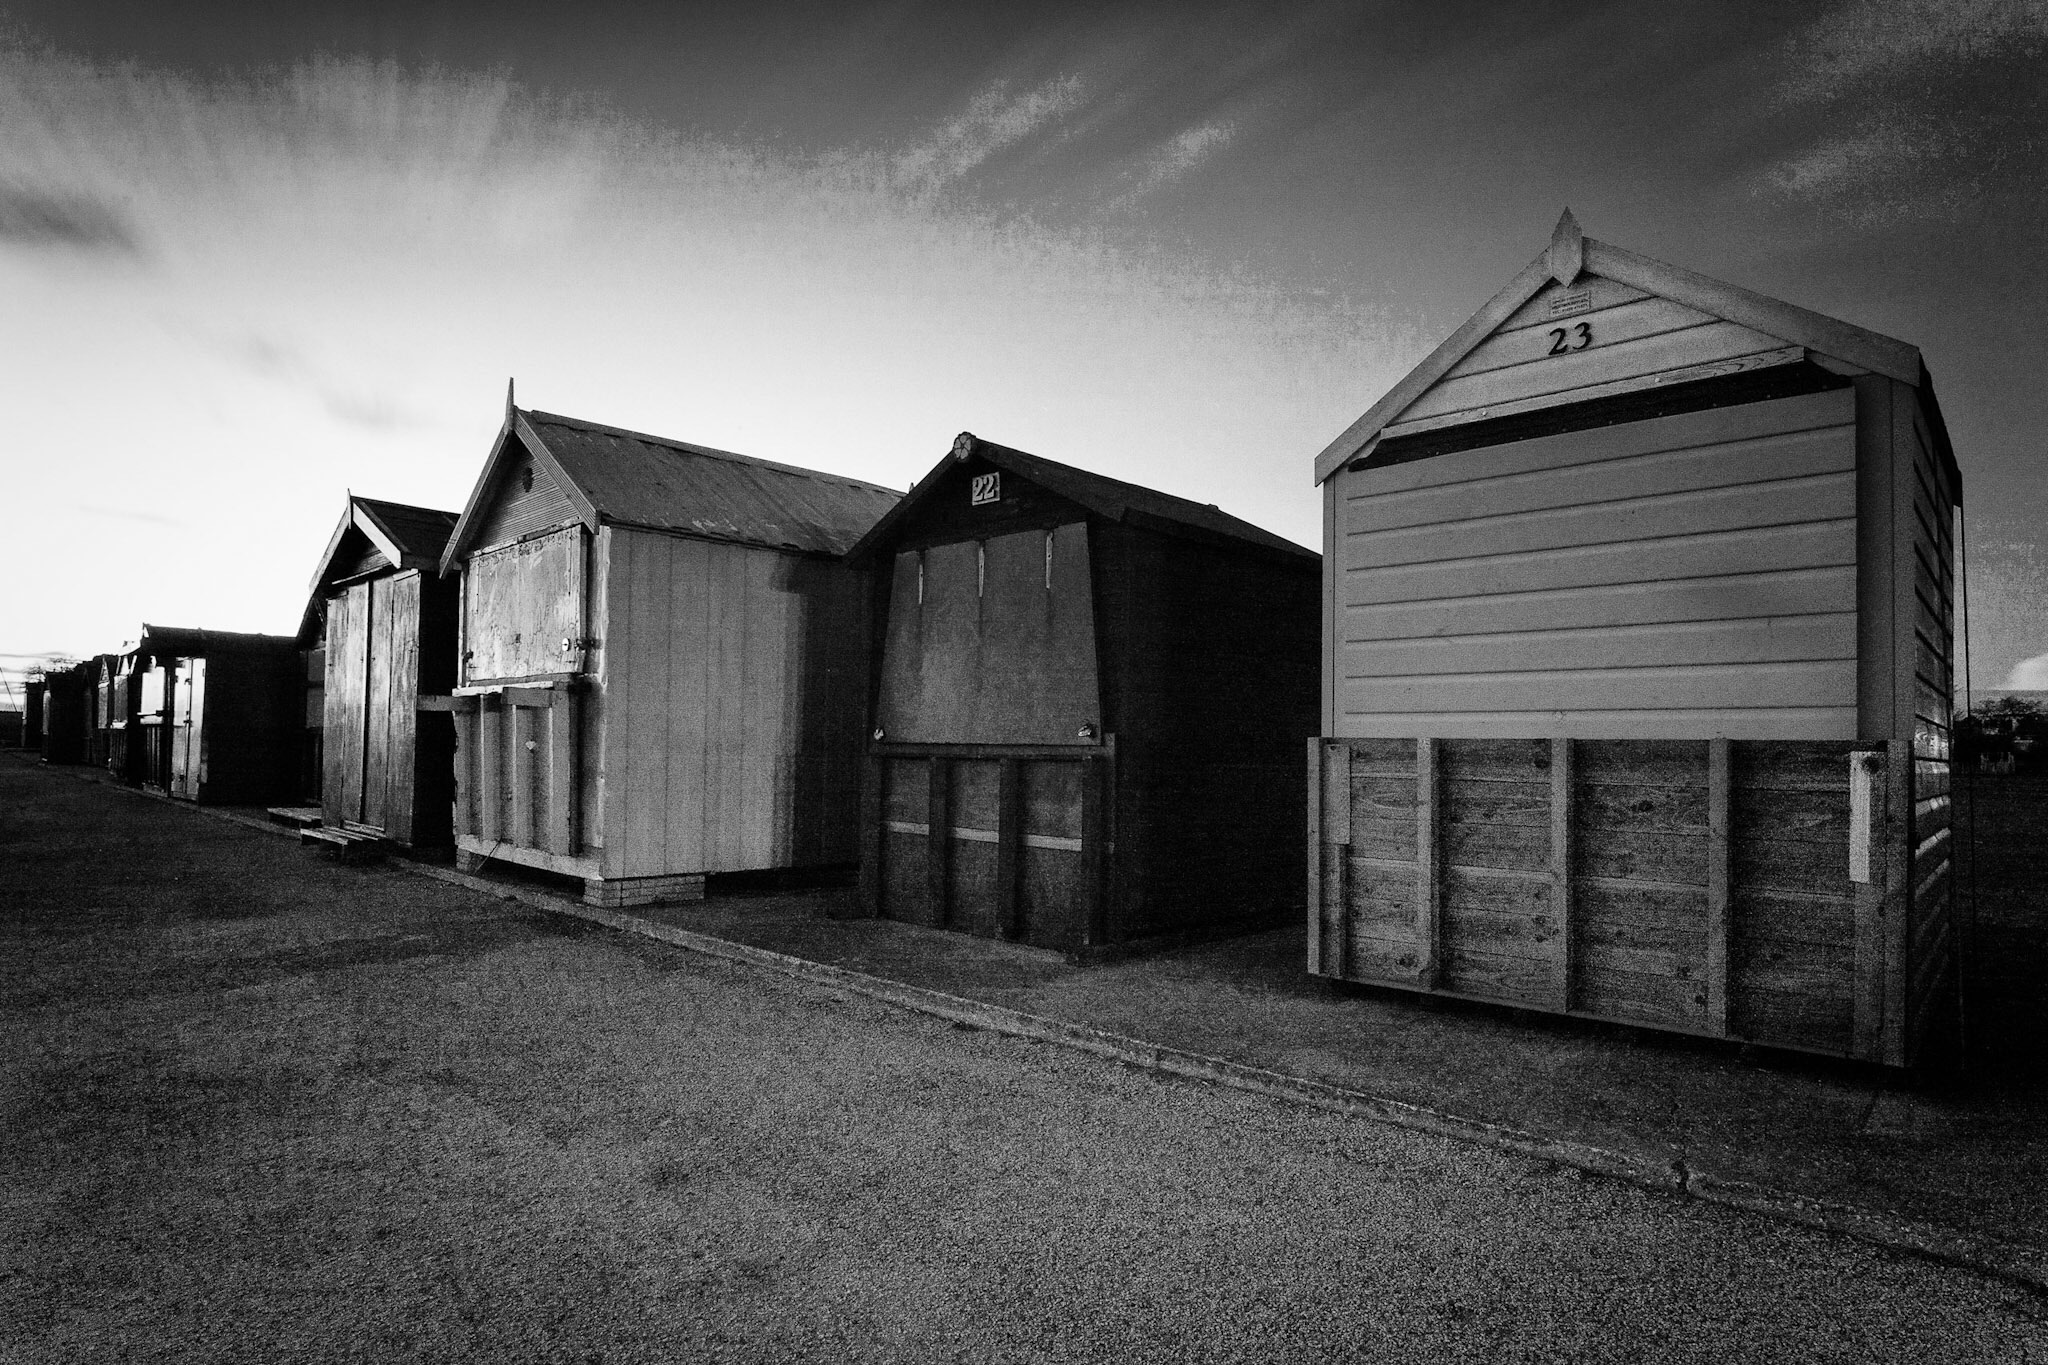 Image text - Hamworthy Beach Huts by Rick McEvoy Dorset Photographer